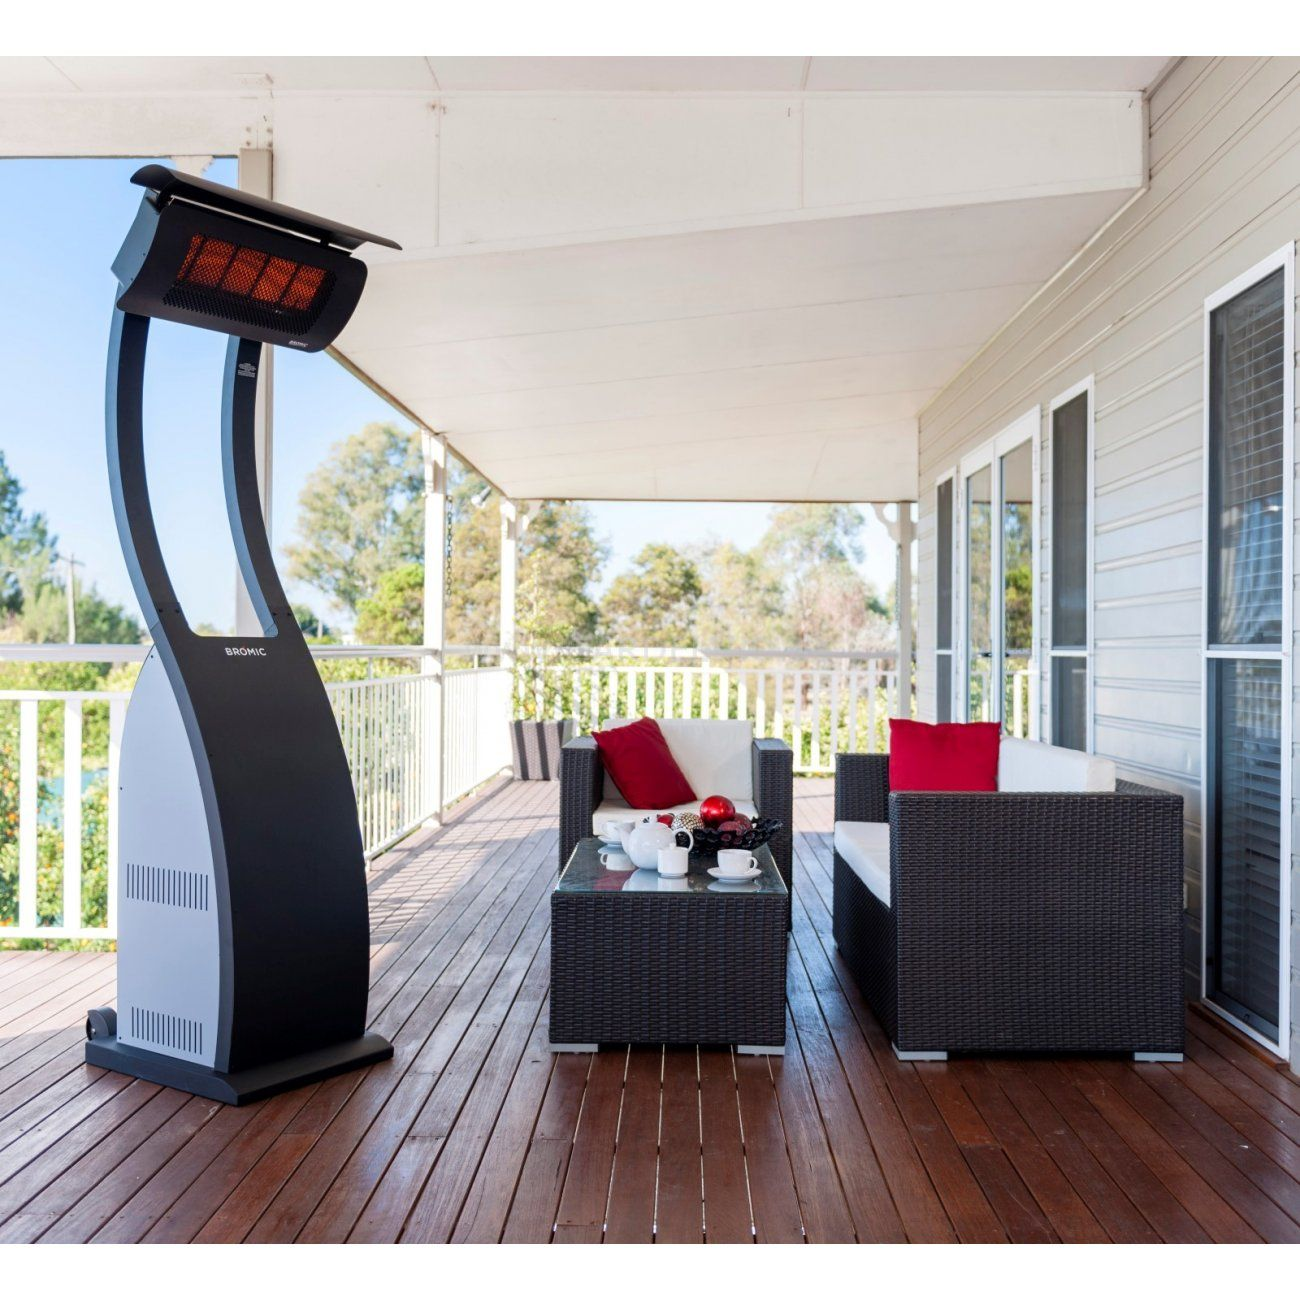 Mobiler Ir Heizstrahler Tungsten Smart Heat Portable Gartenmobel Sets Balkonentwurf Heizstrahler